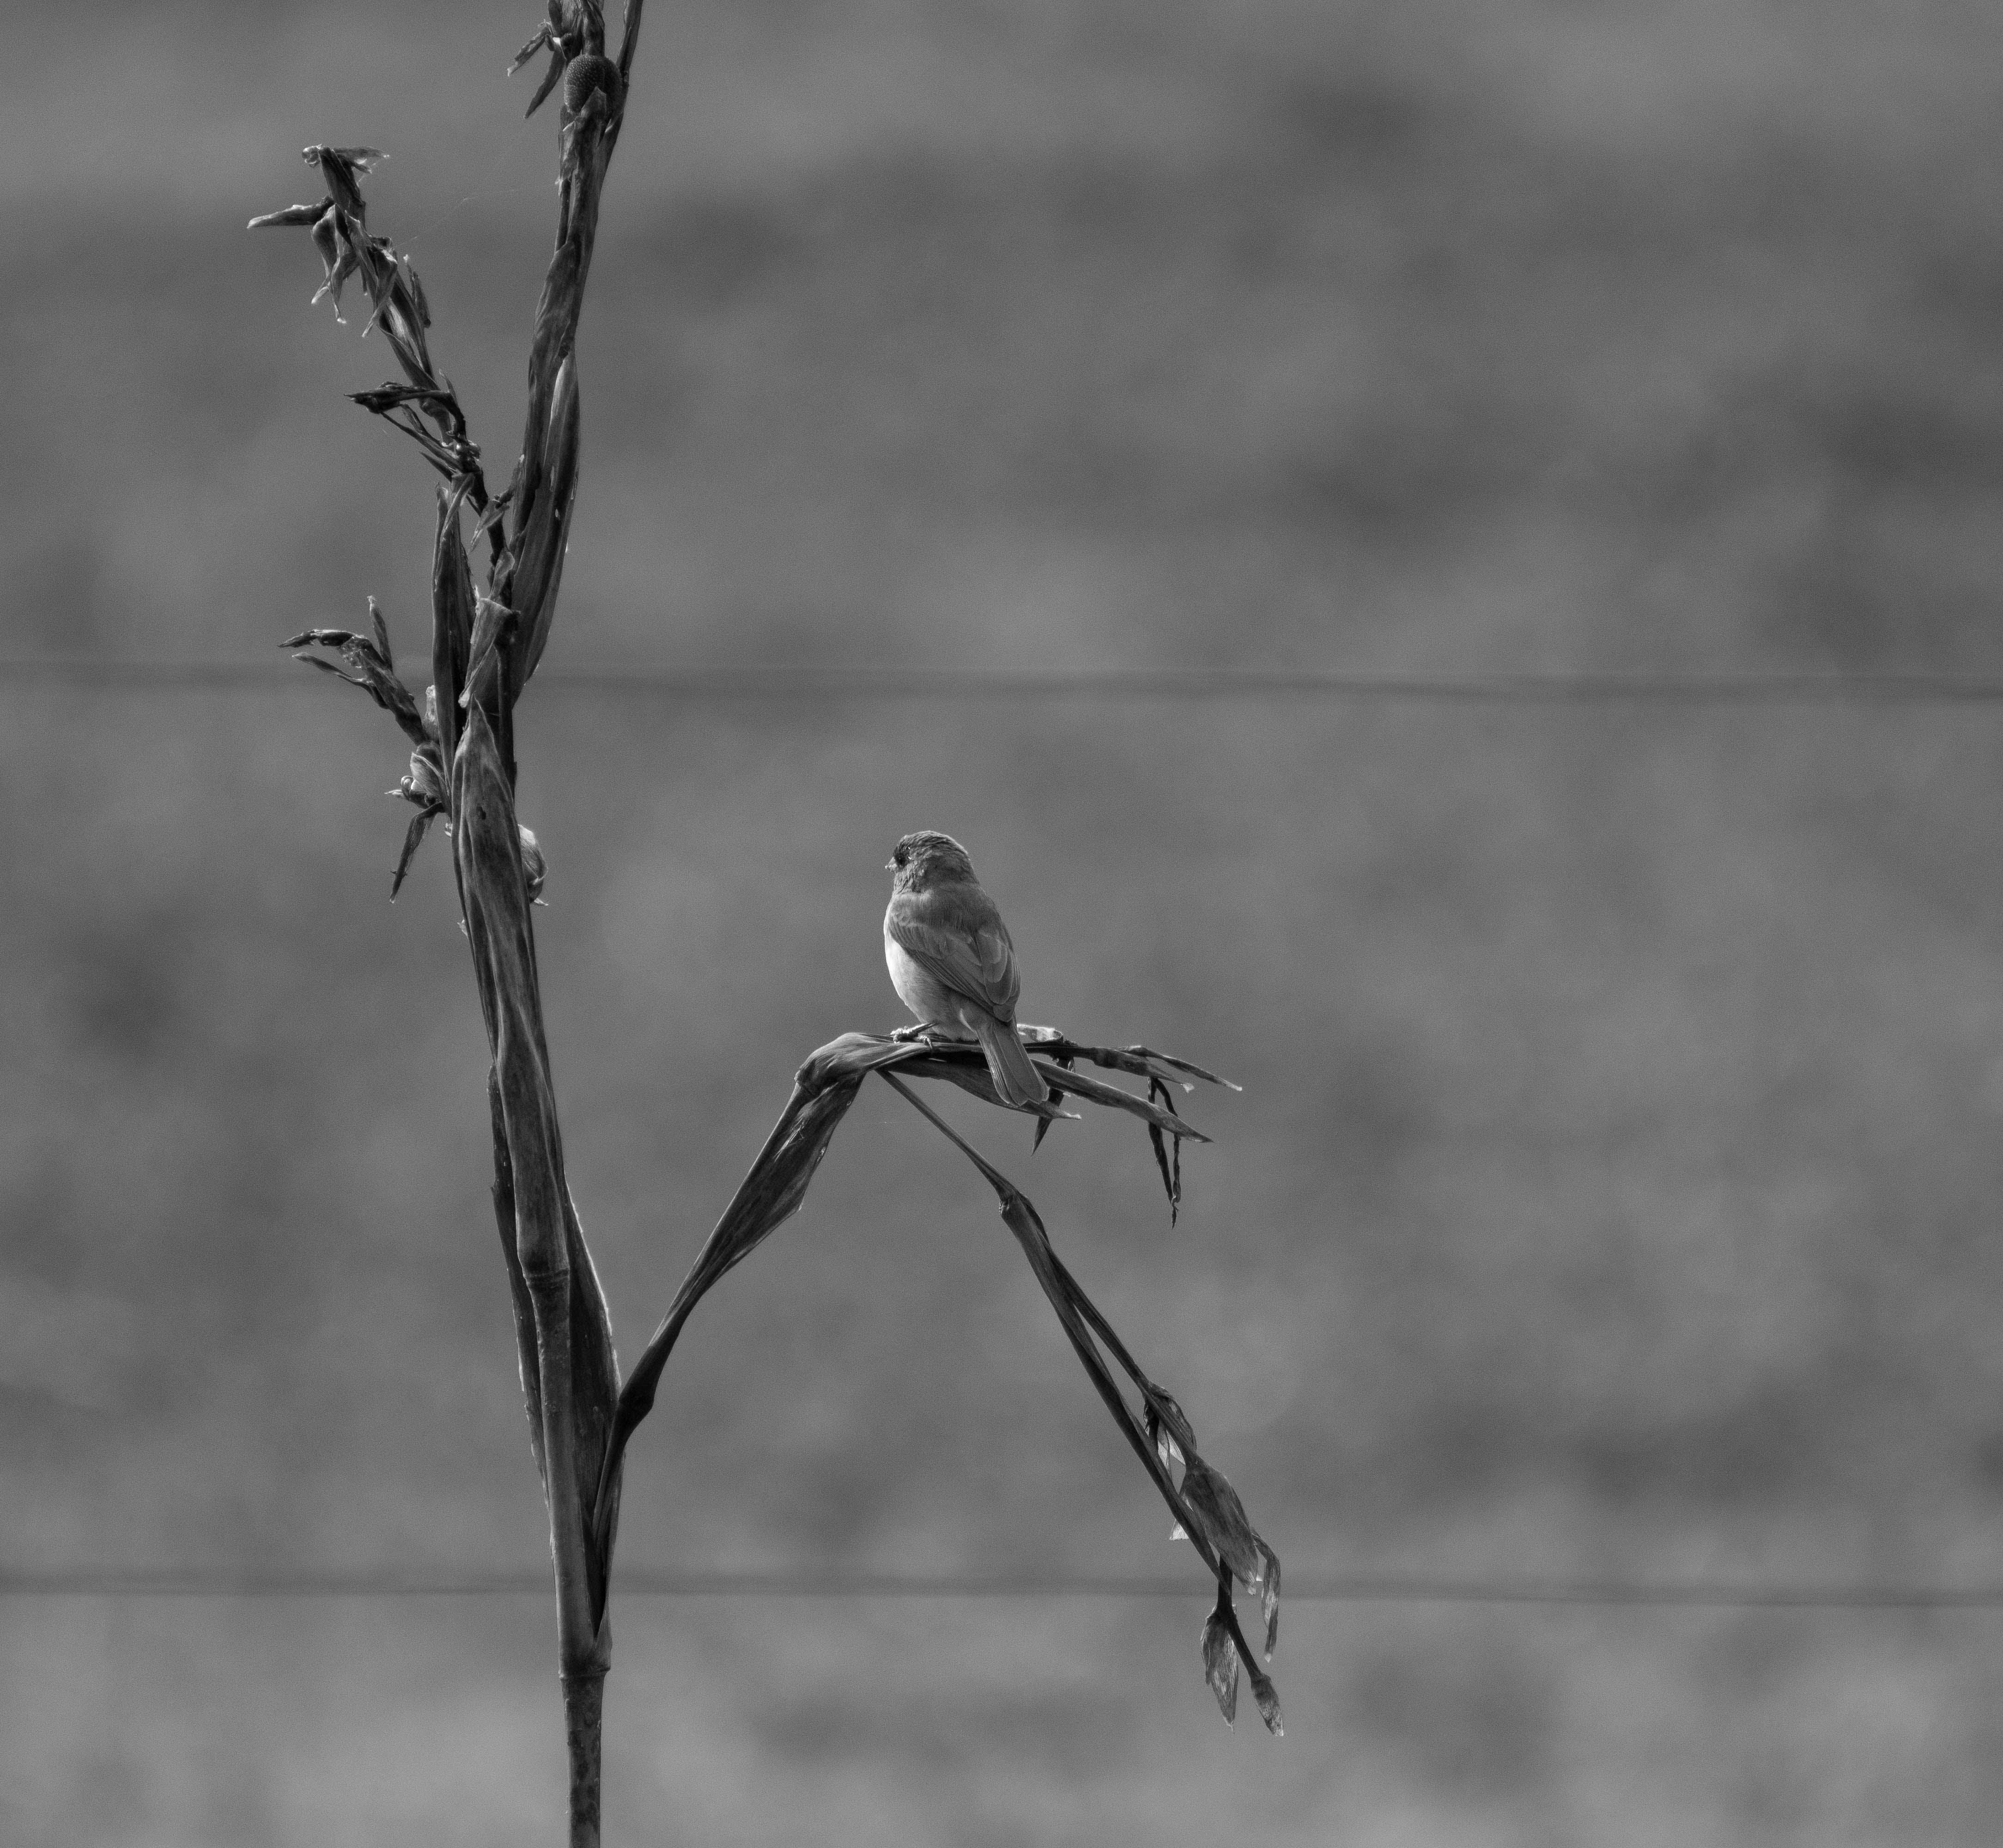 Free stock photo of bird, black and white, black and-white, thinking